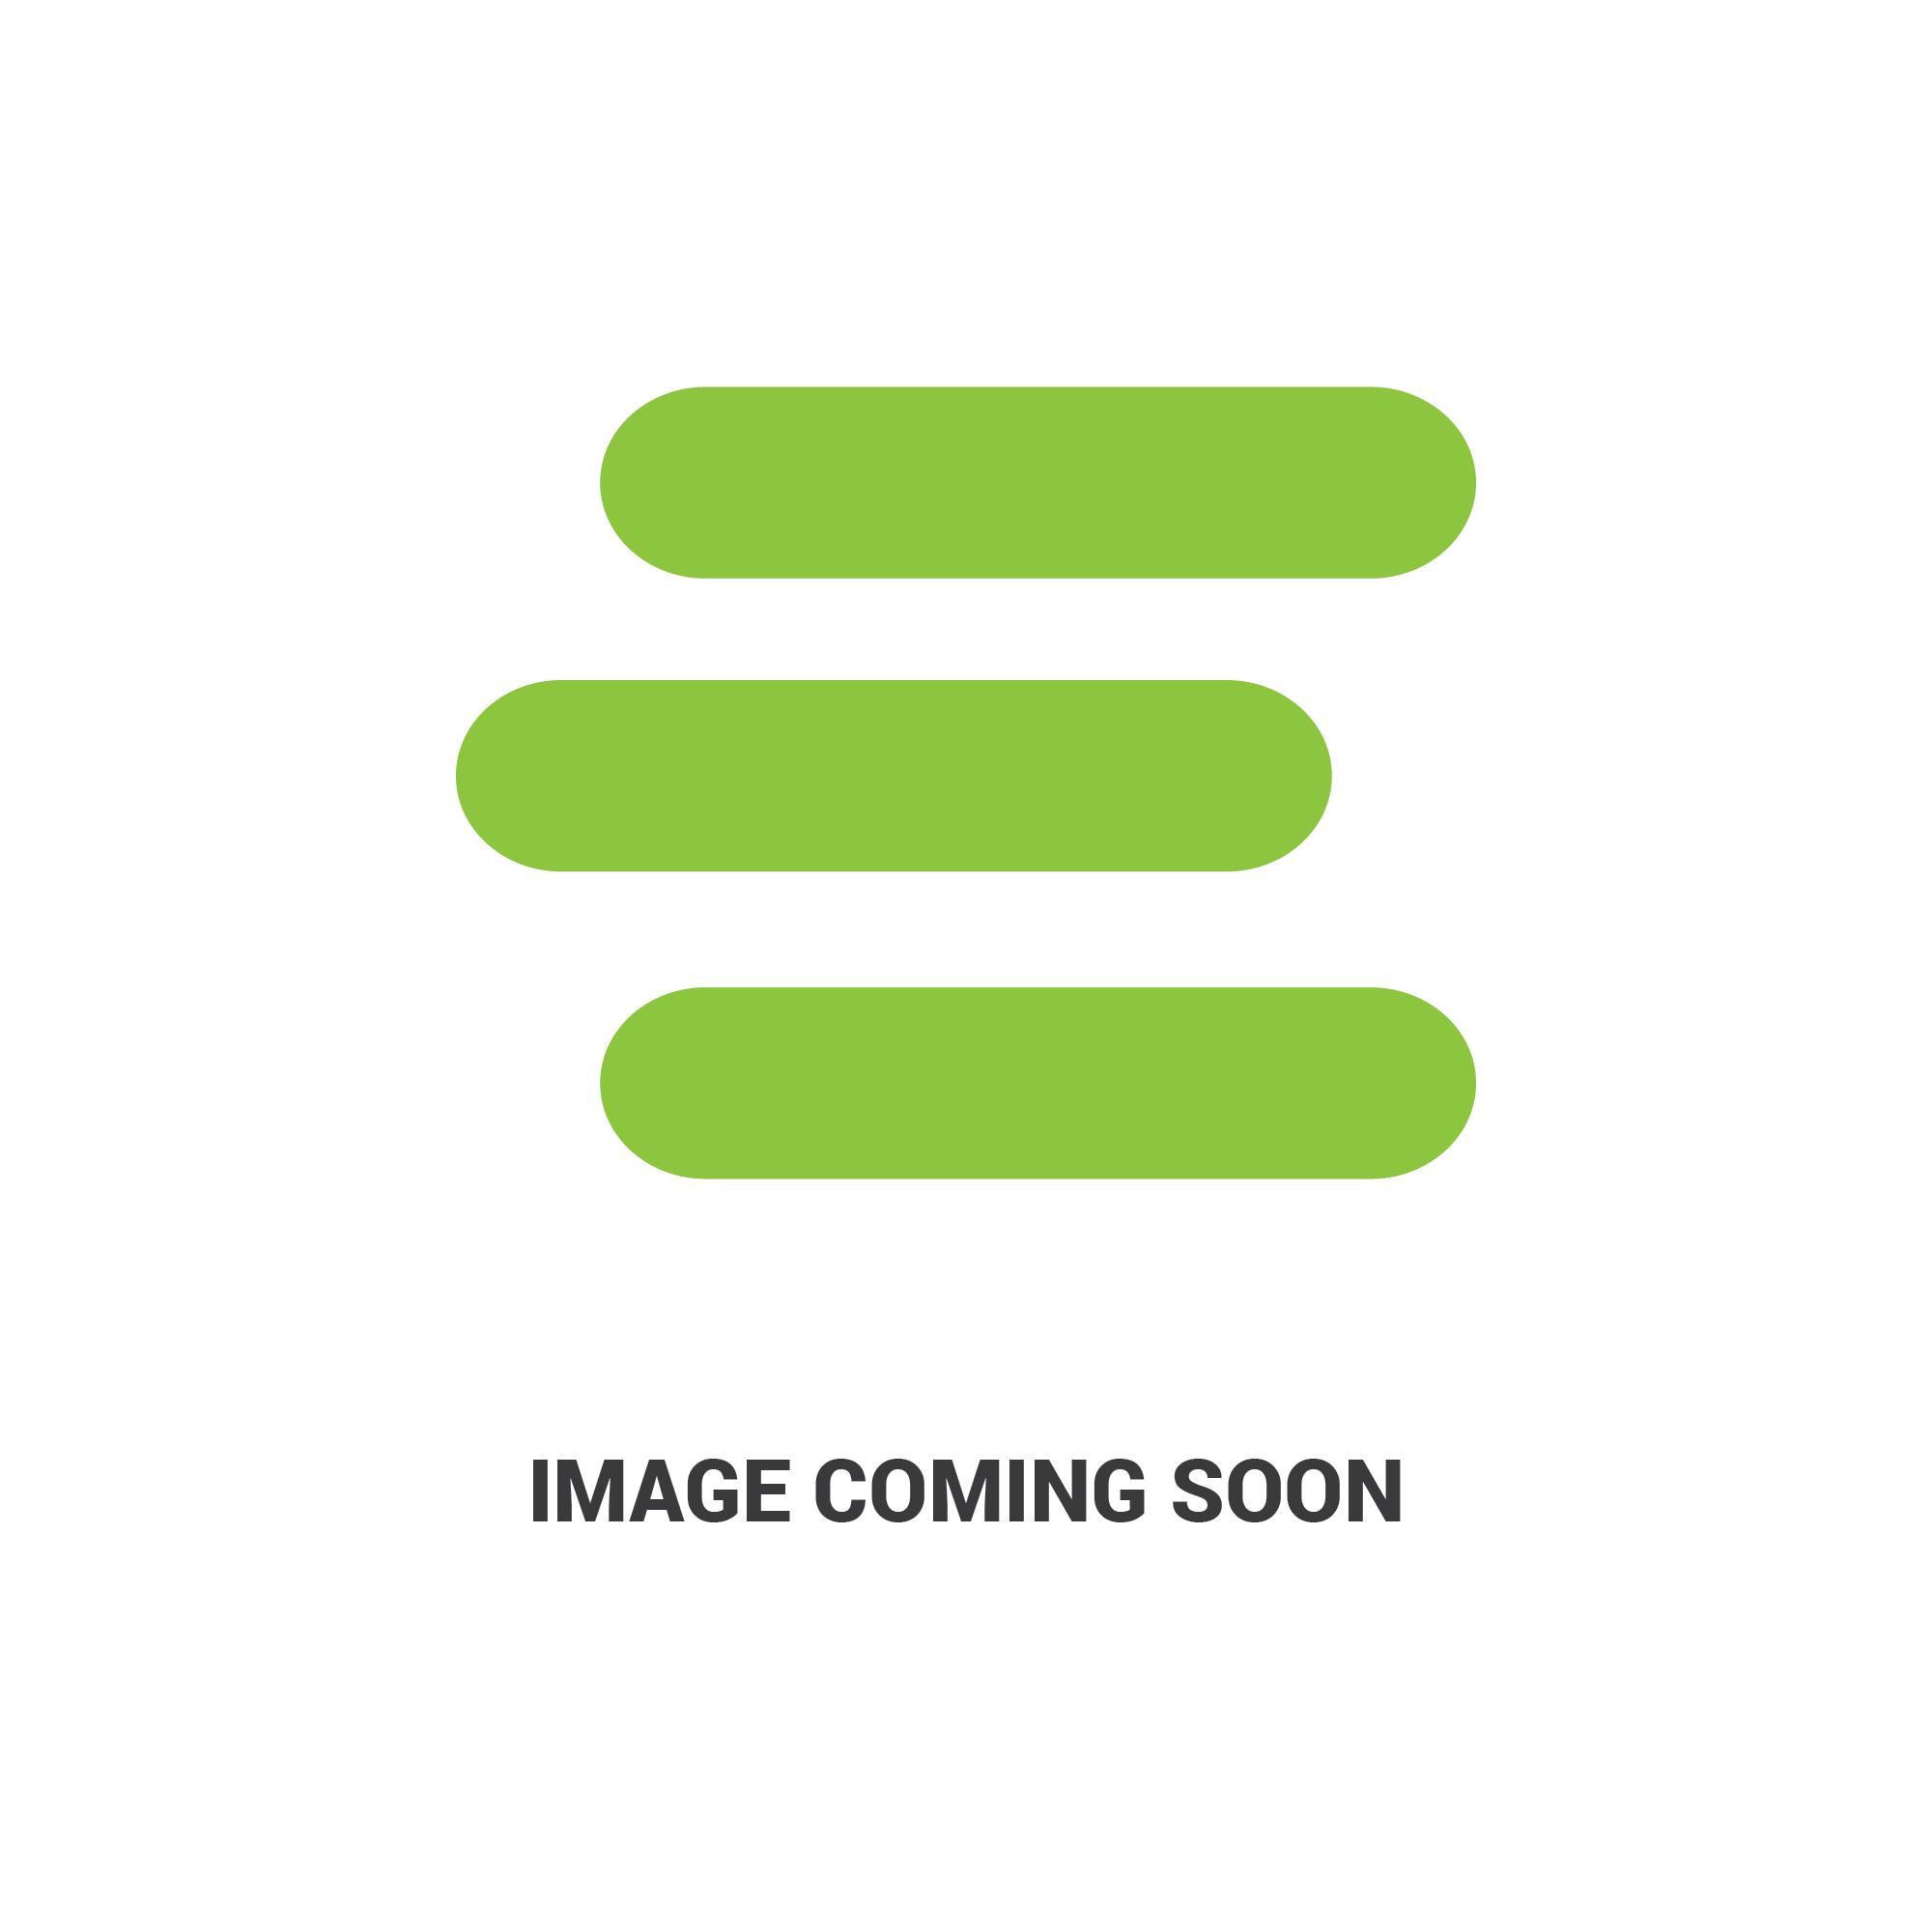 E-839522662071_10.jpg